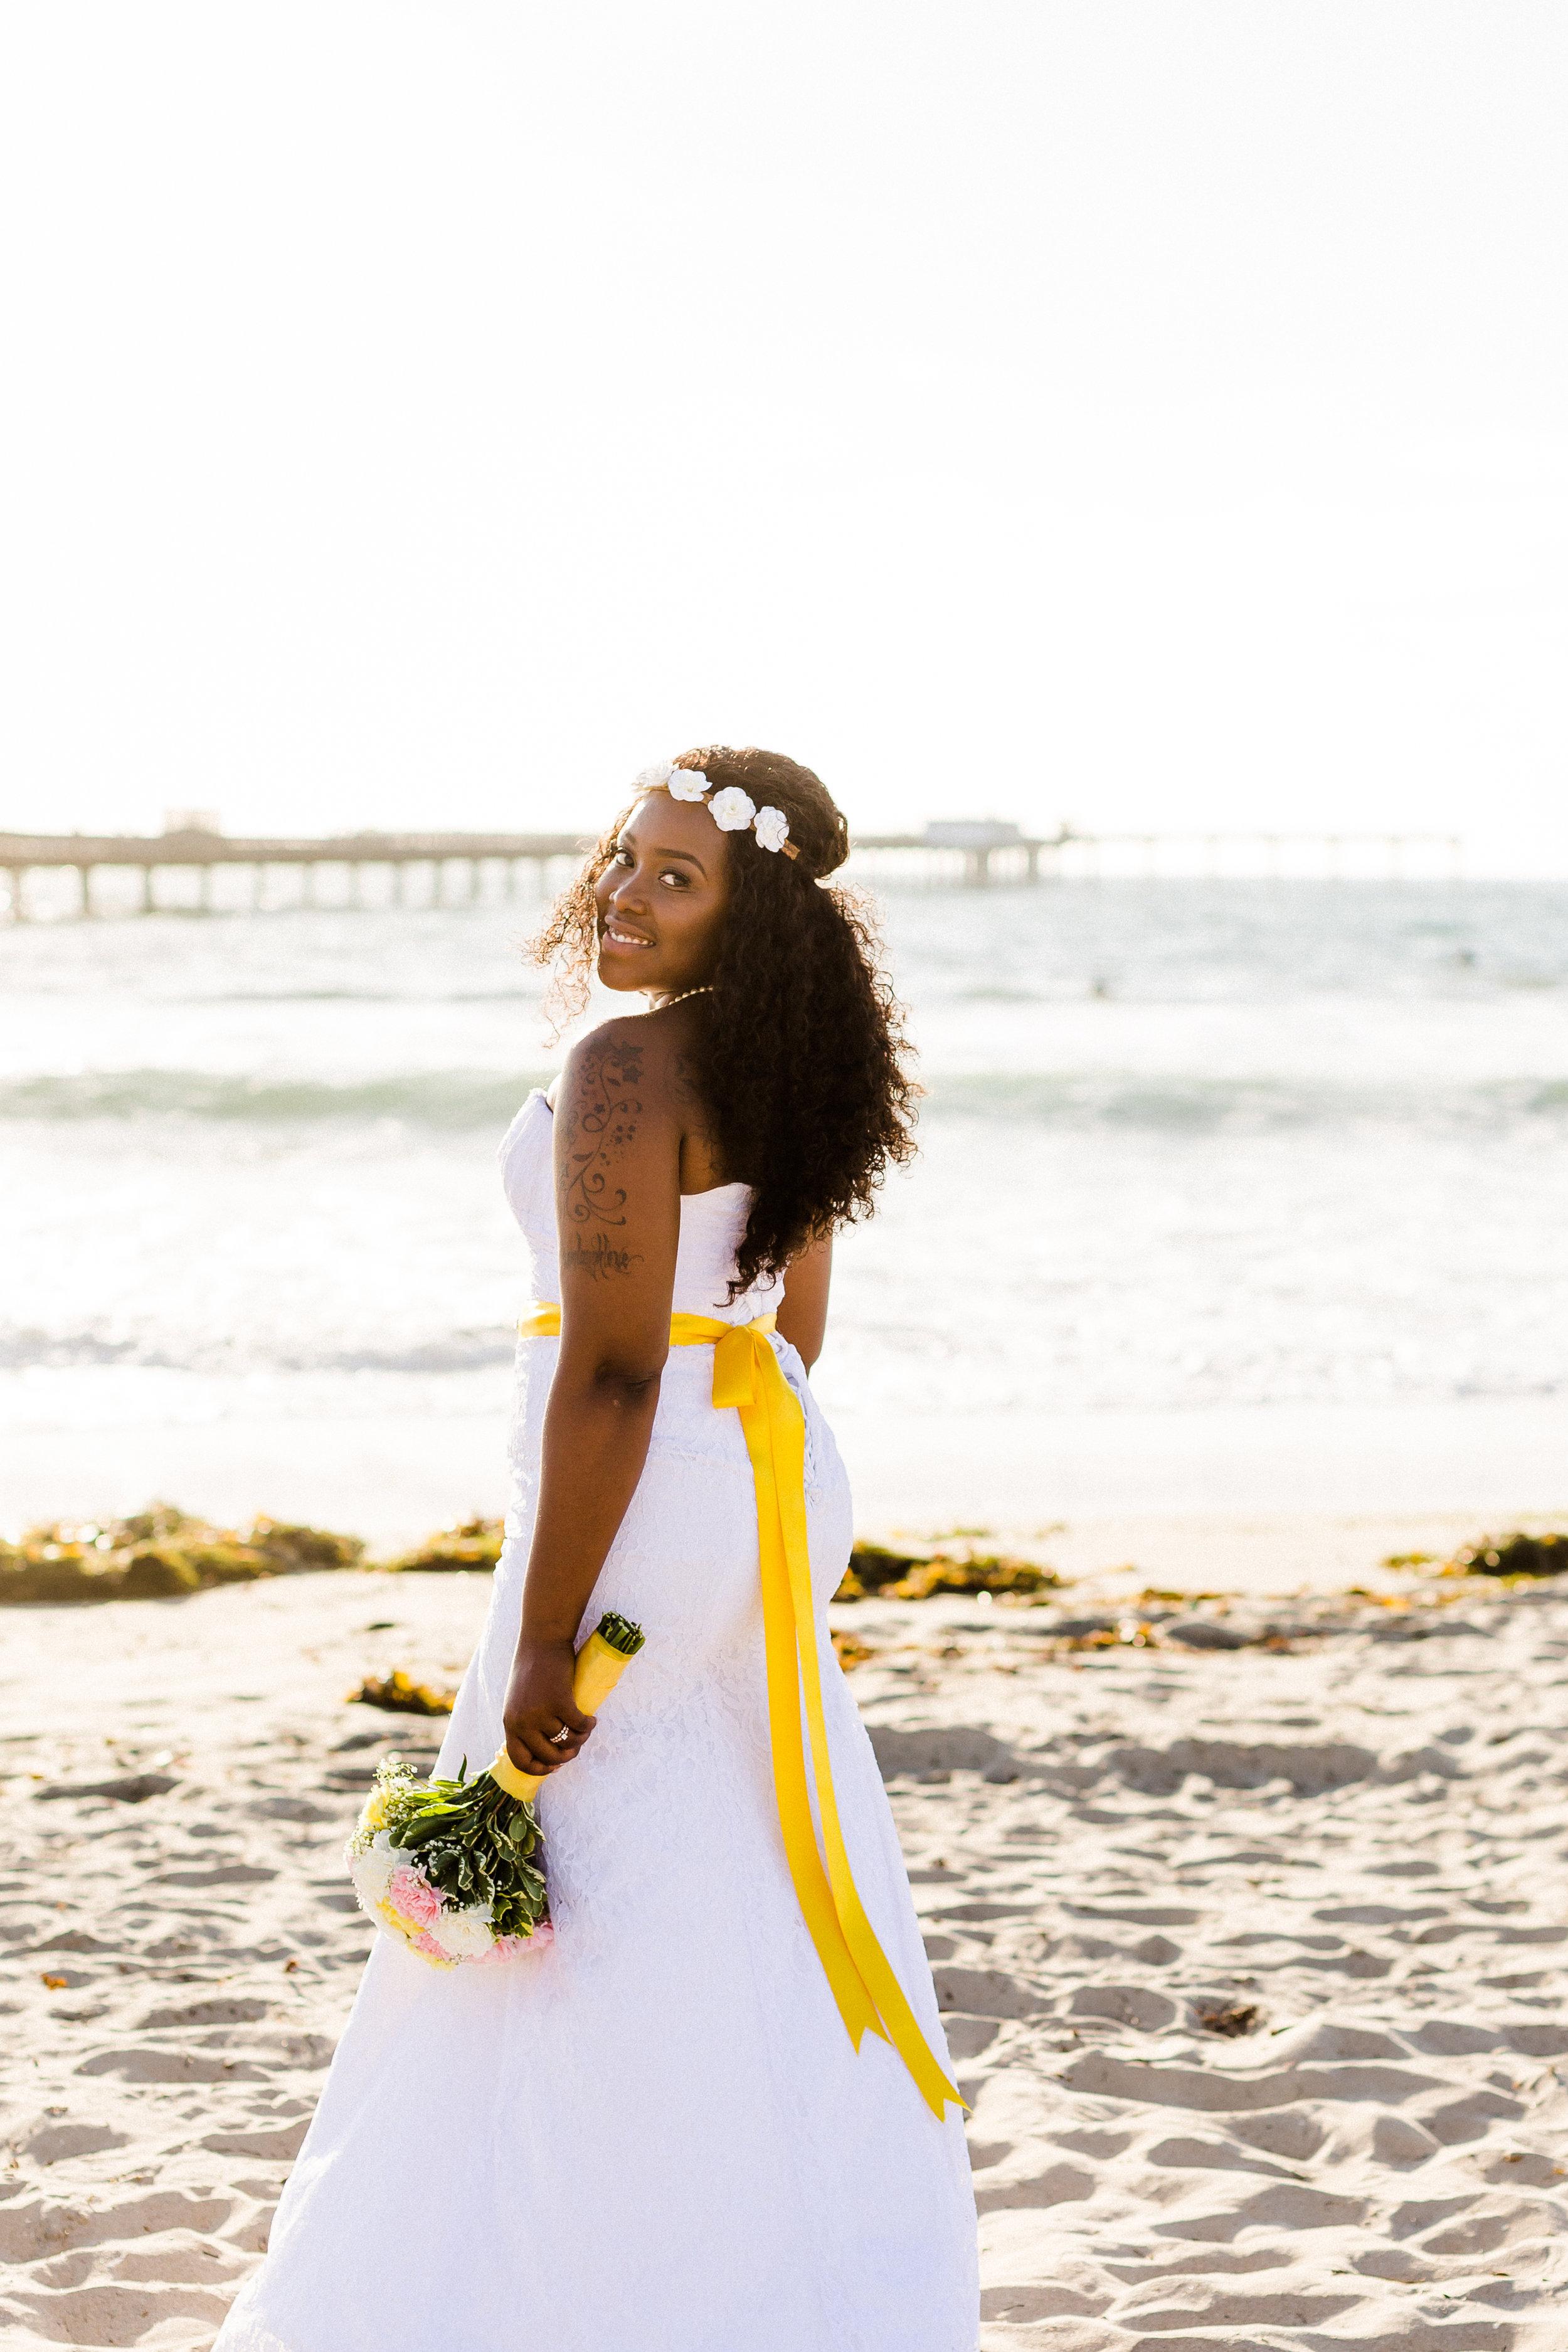 Crystal_Sabrina_Ocean_Beach_Wed_Session_100.jpg